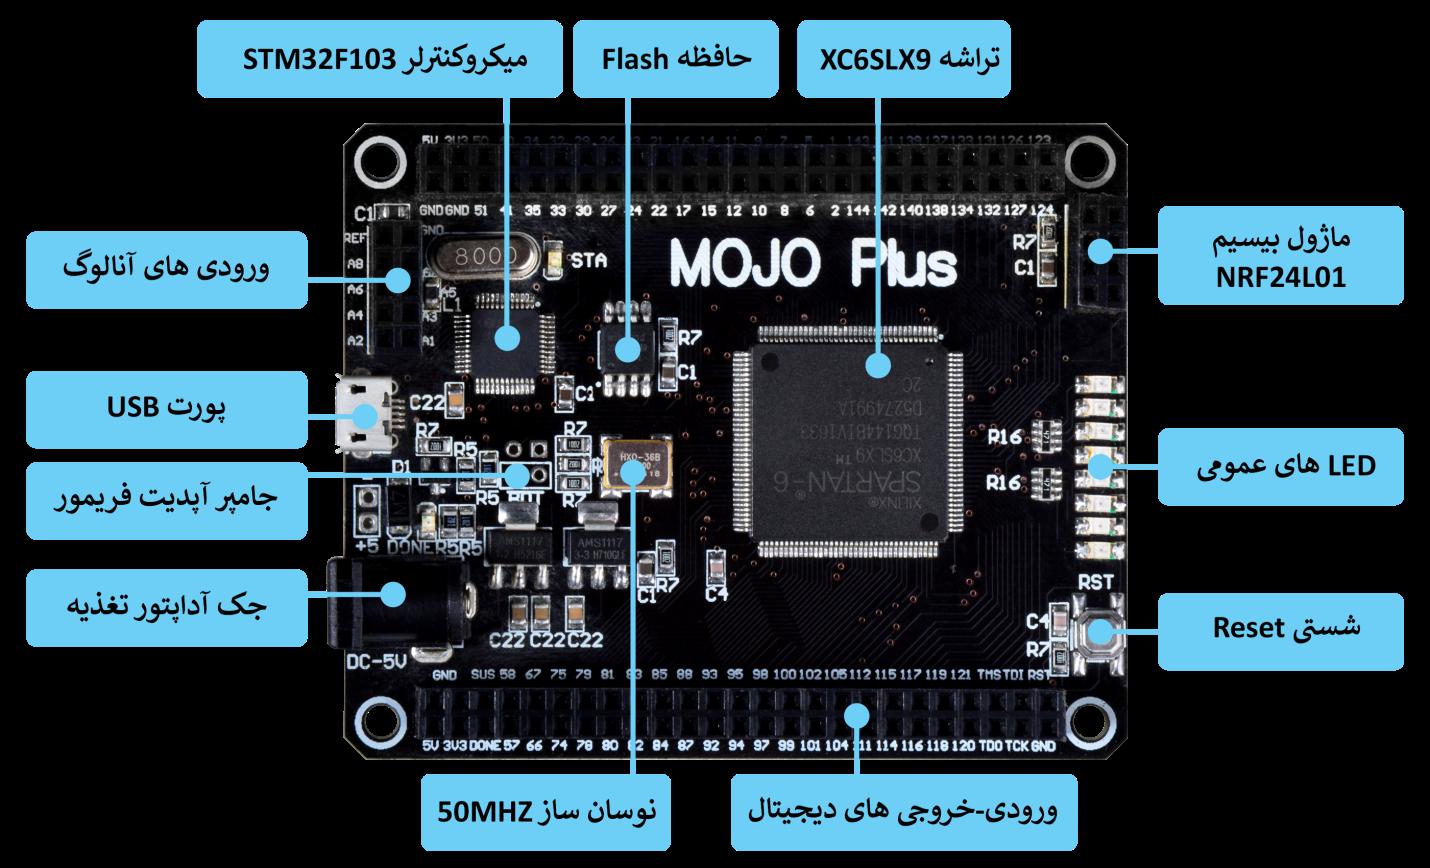 C:\Users\Araz\Desktop\Images\Mojo-Parts.png